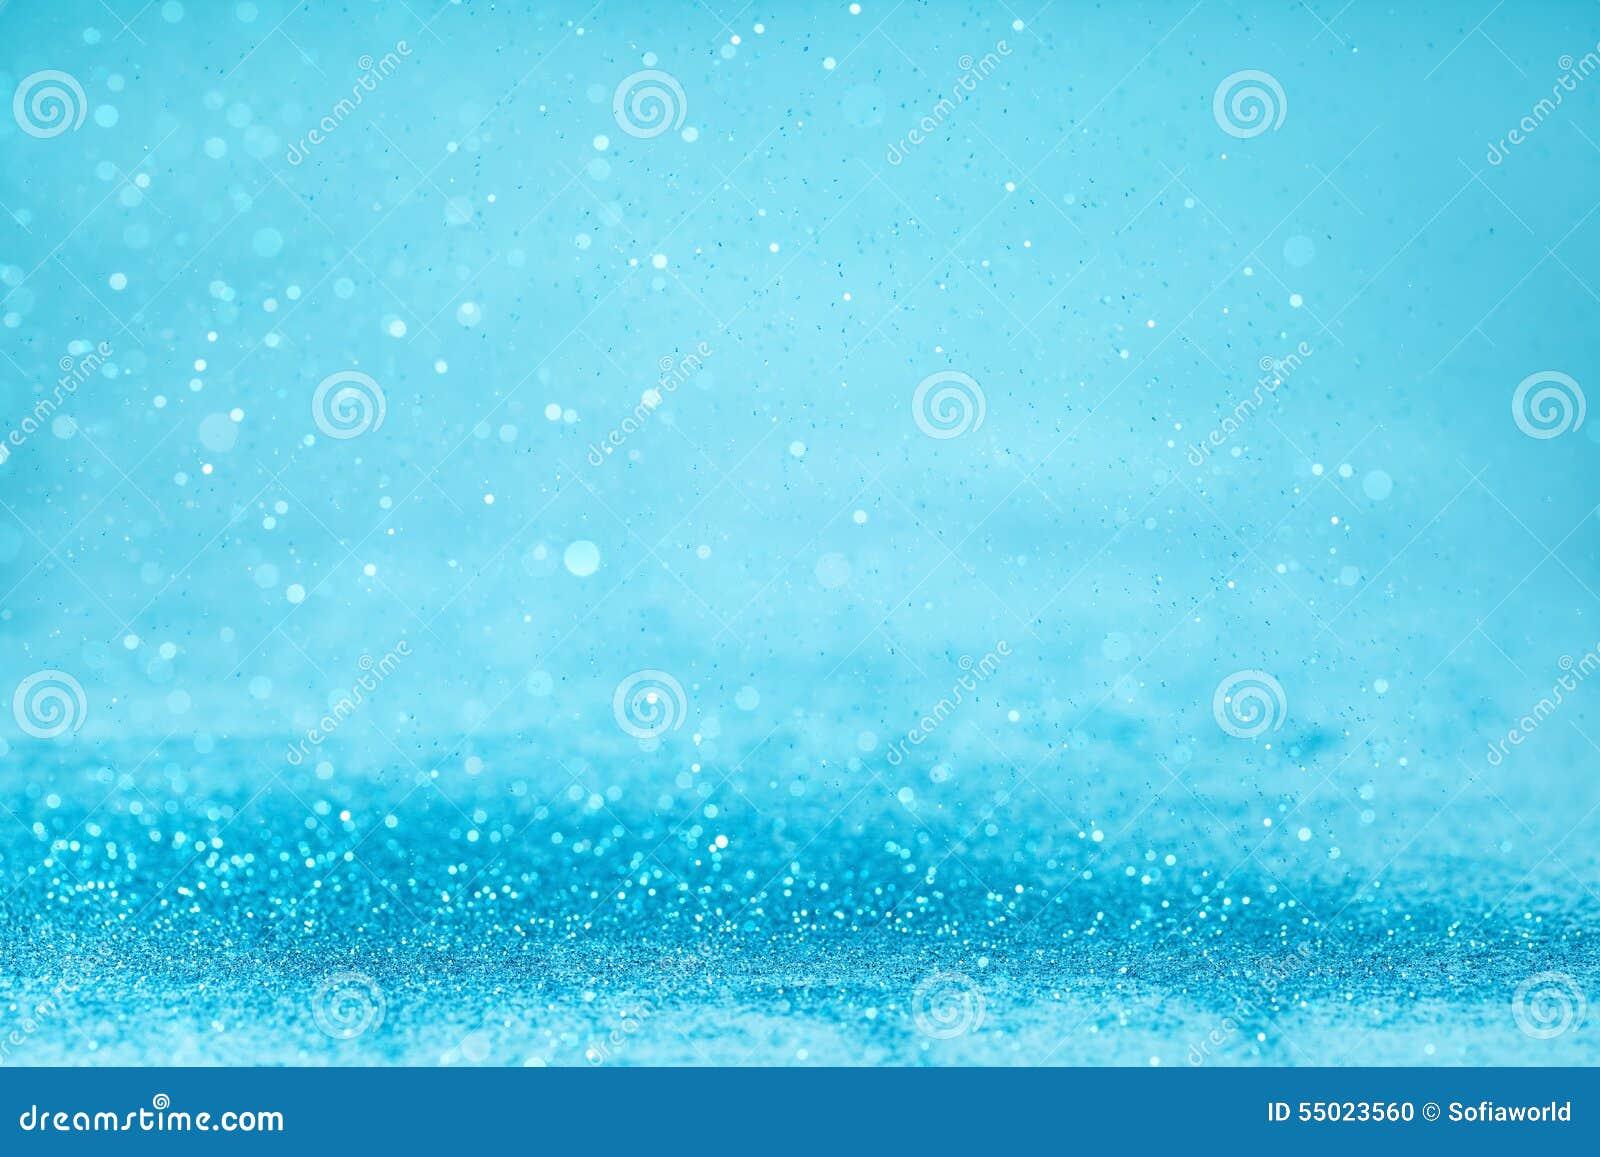 Blue twinkle background